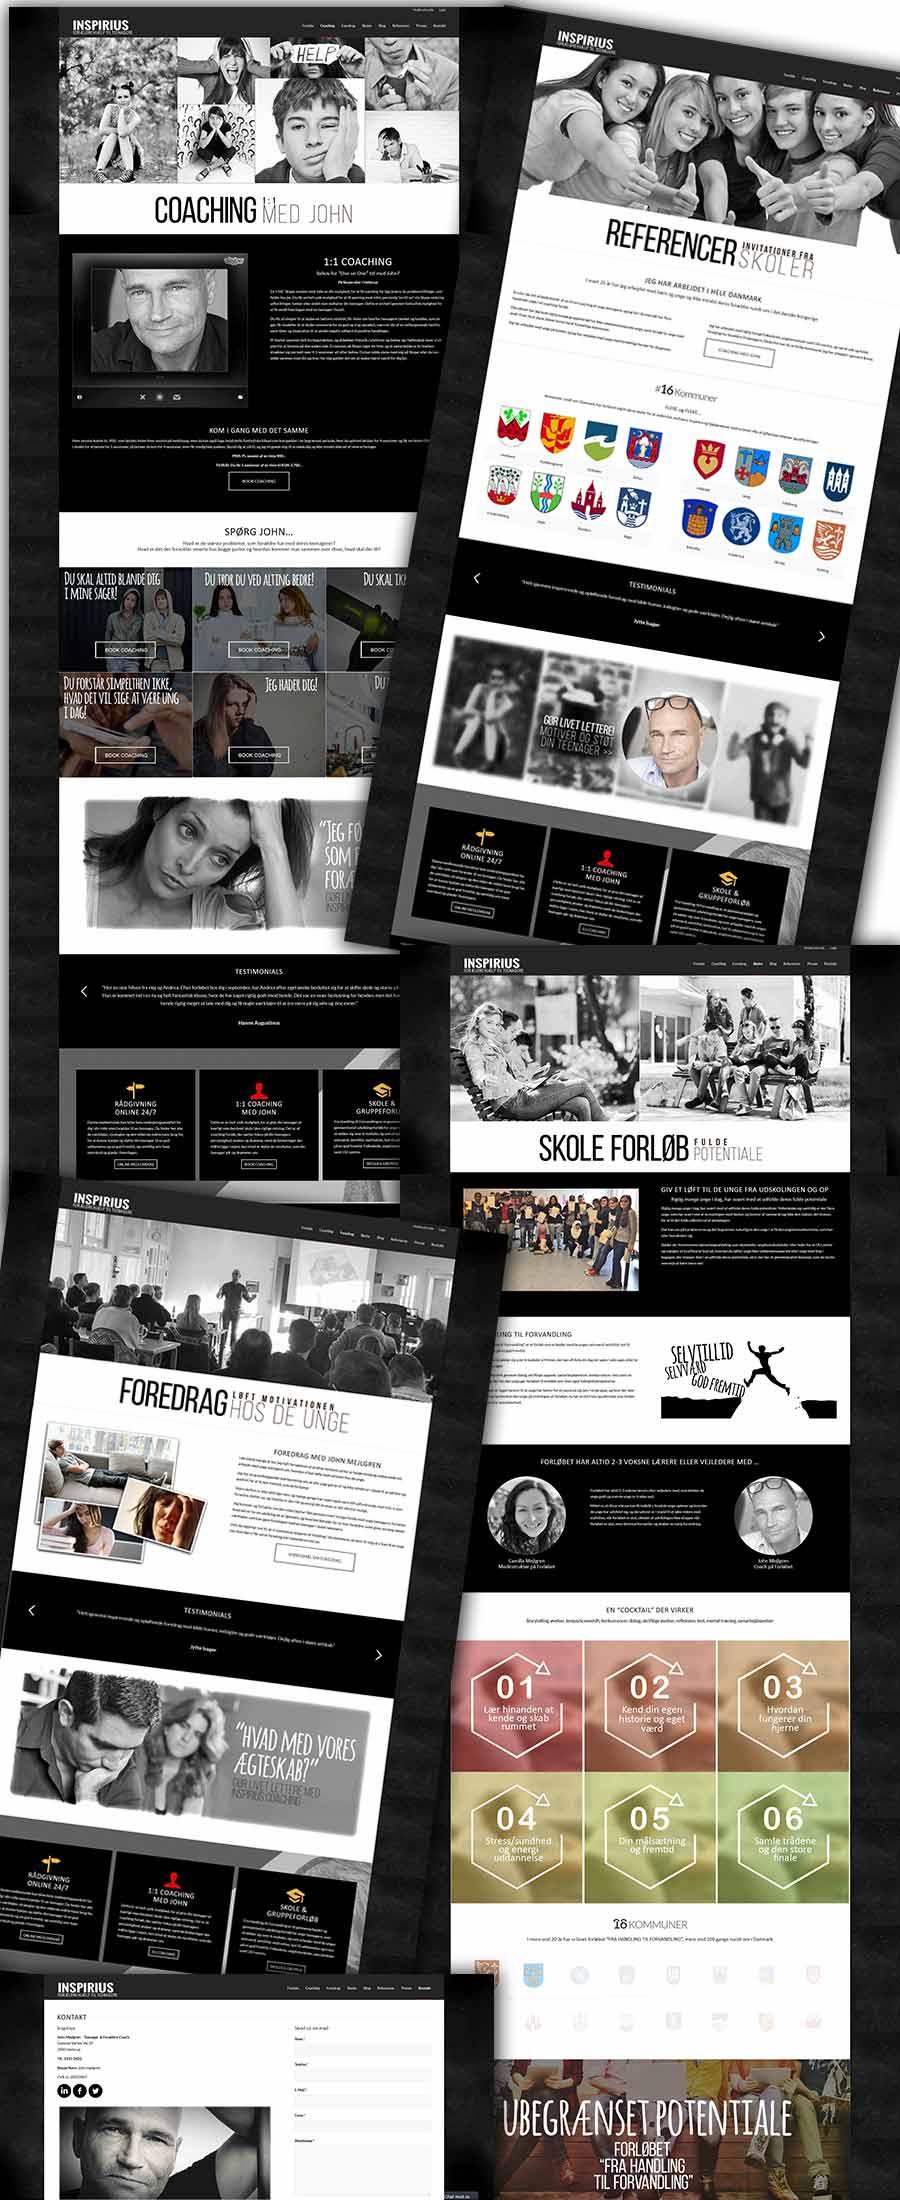 Inspirius.dk screenshots fra den ny teenager coaching hjemmeside